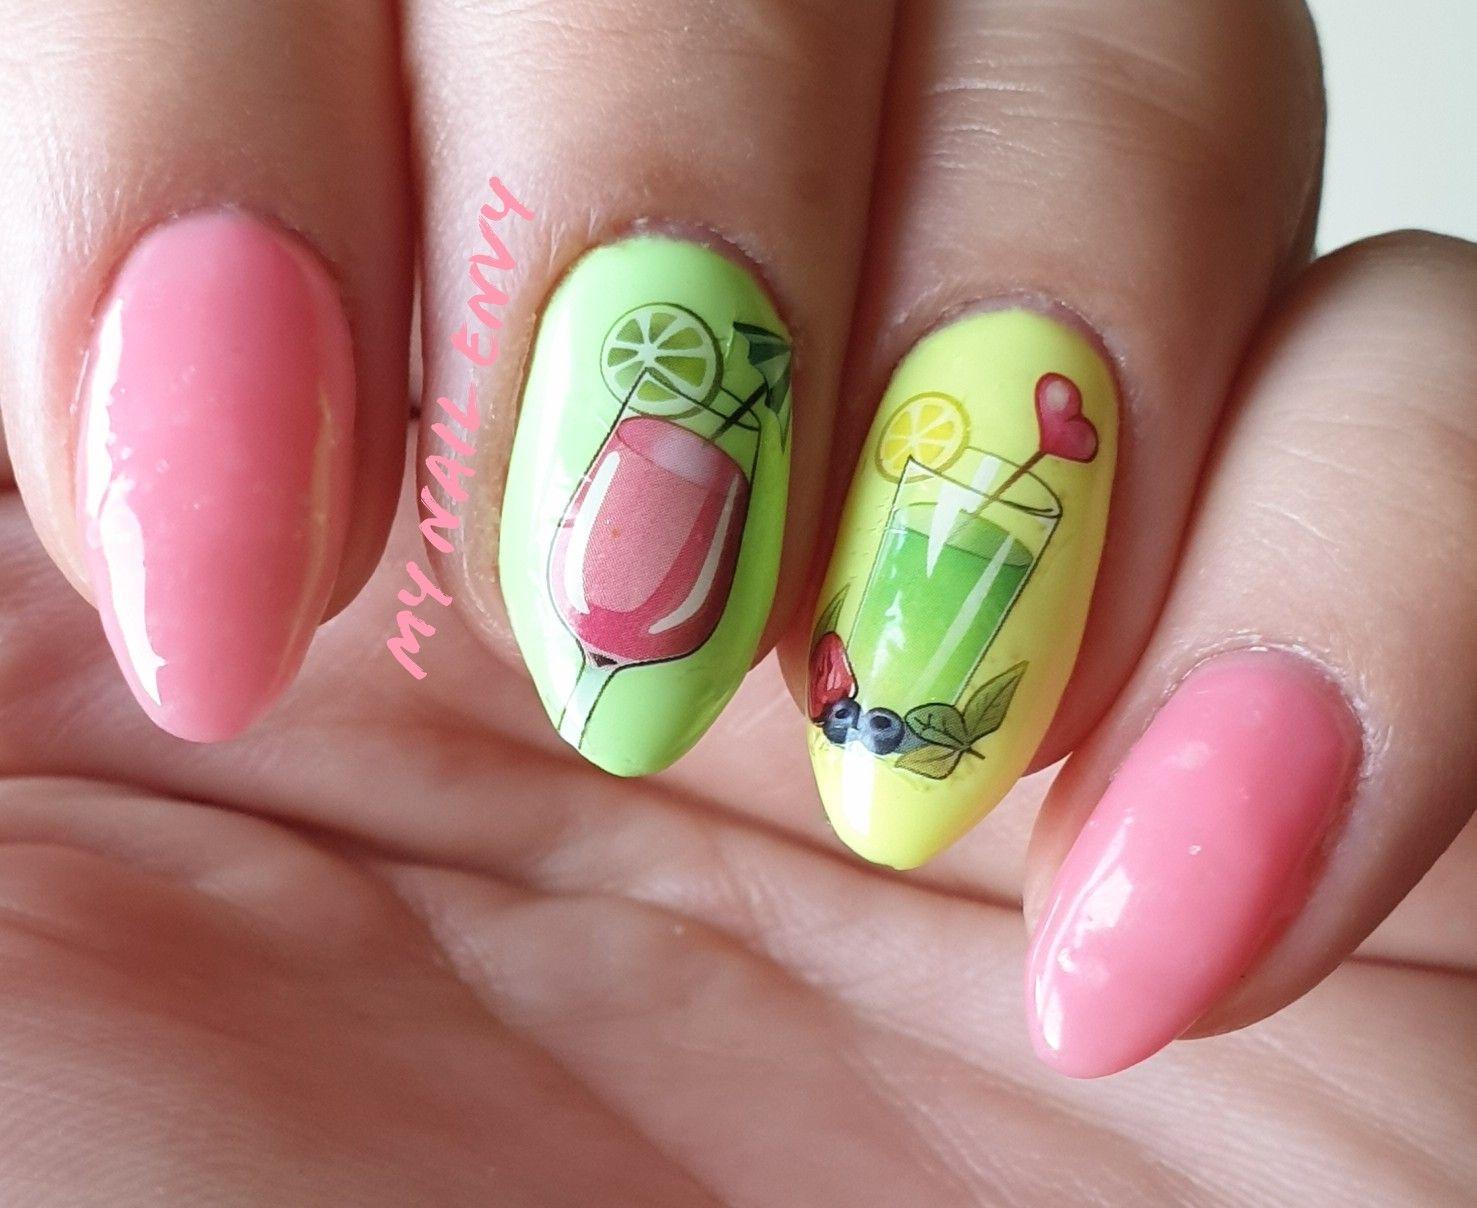 🍹  #nailart #shortnails #naturalnails #nails #mani #nailsaddict #nailblogger #nailspiration #tropicalnails #summernails #cocktailnails